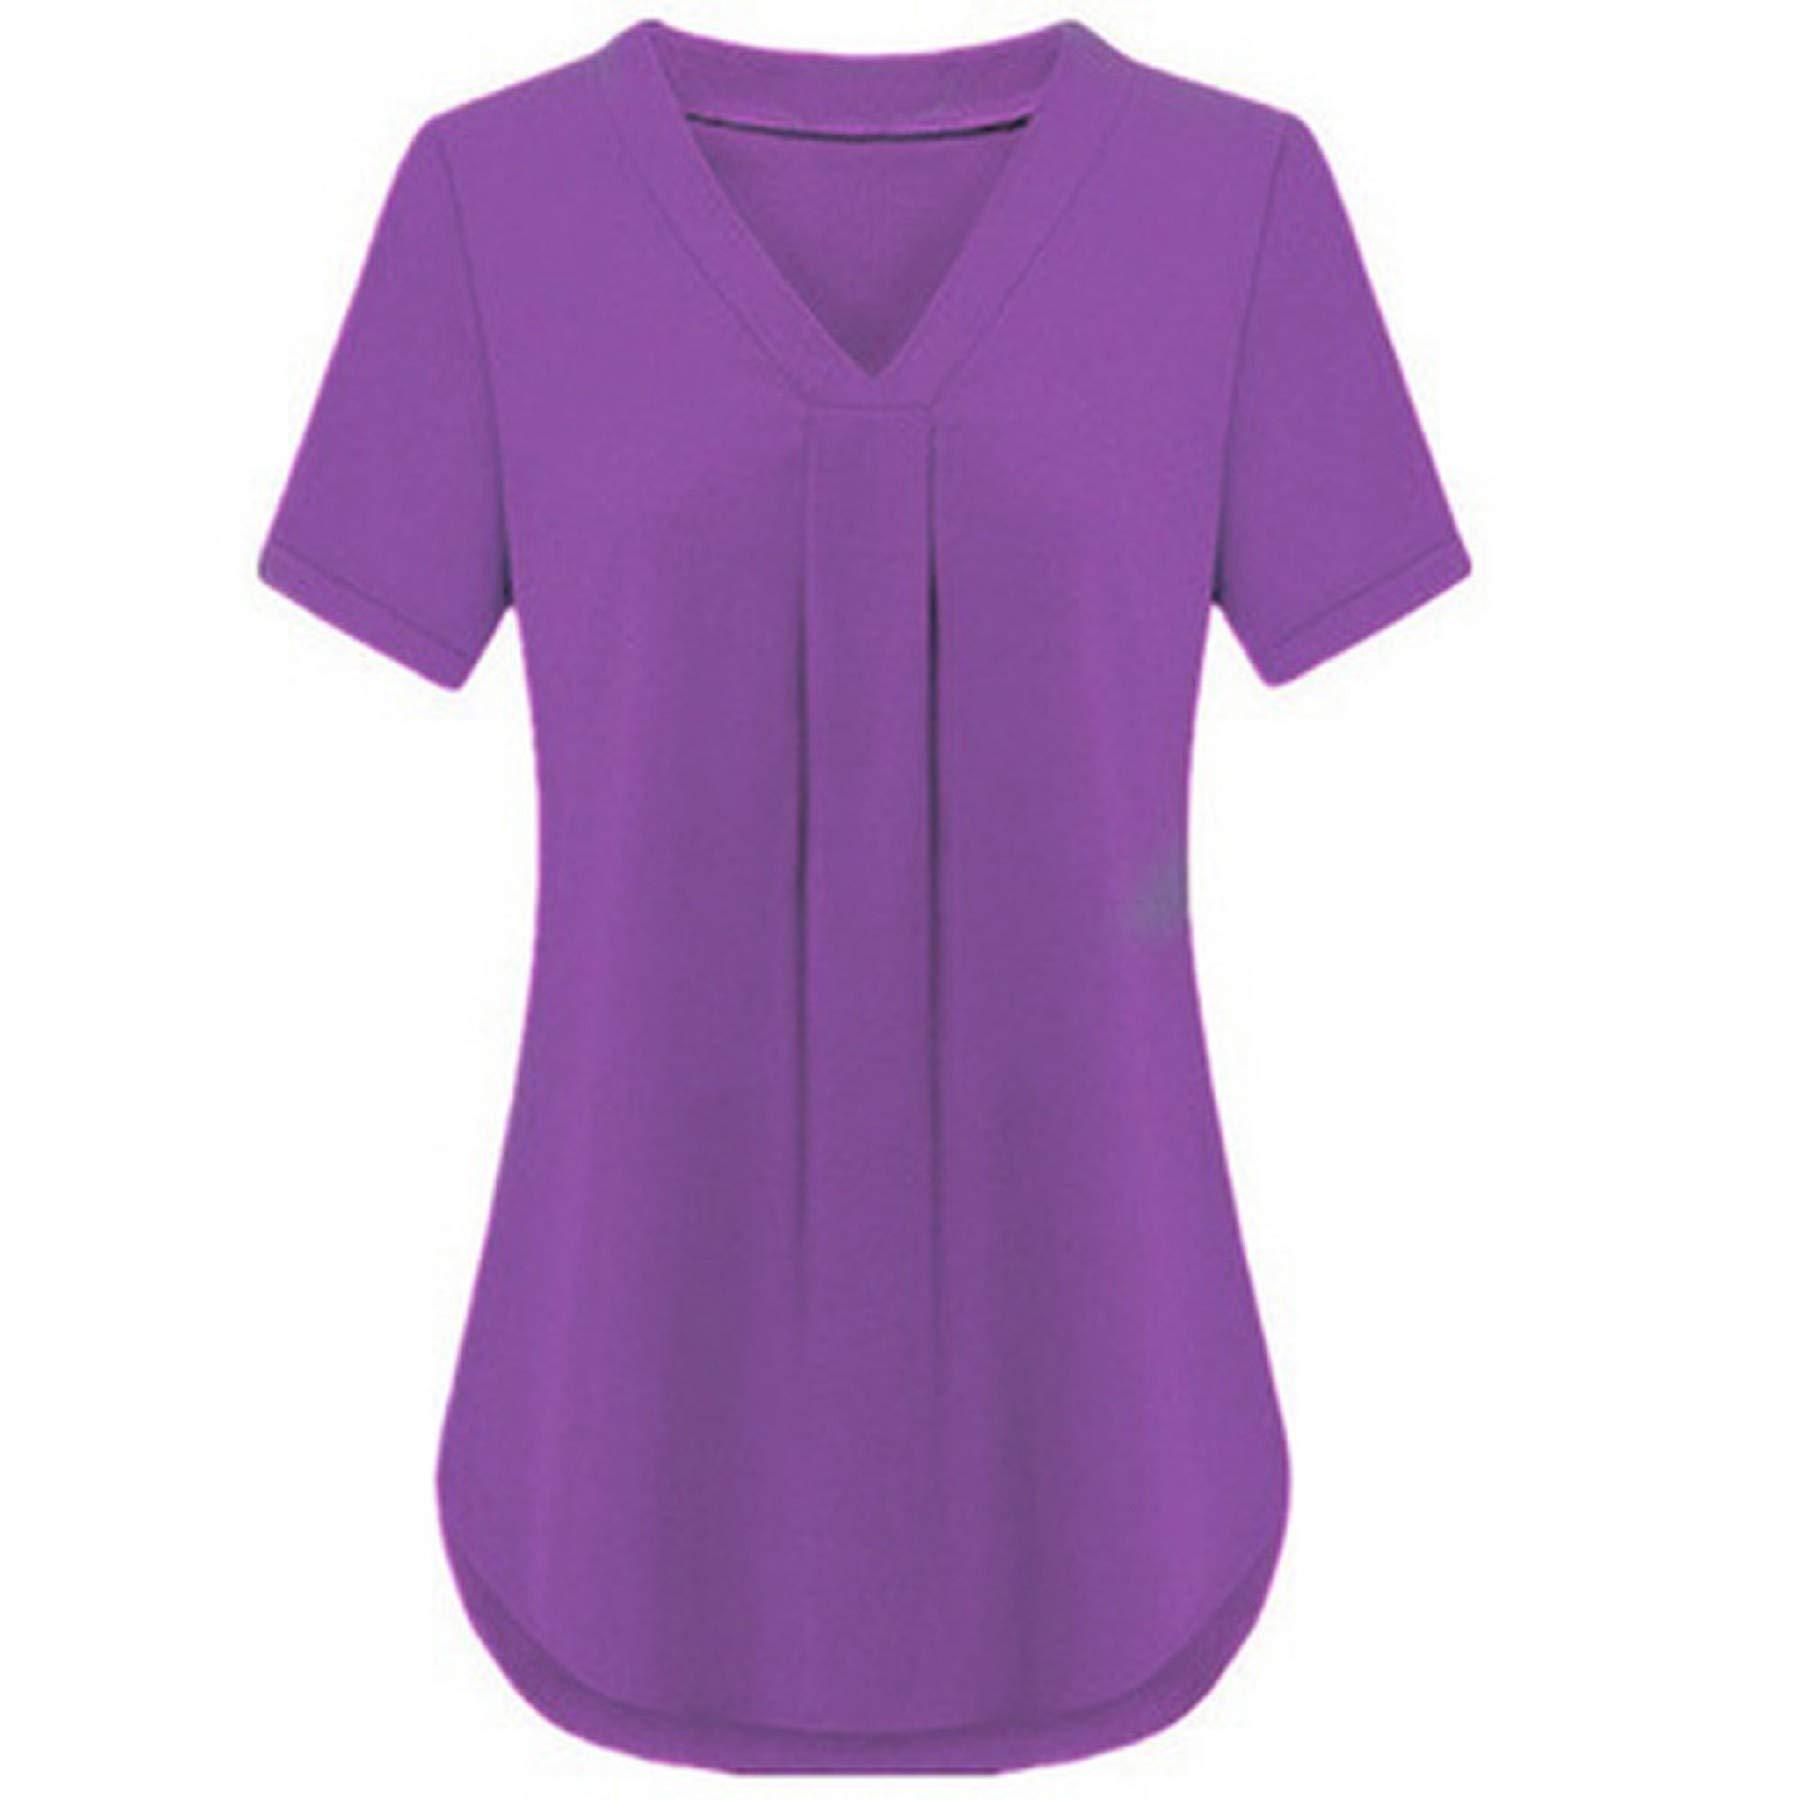 Women's Summer Short Sleeve V Neck Chiffon T Shirt Plus Size Casual Fashion Solid Loose Blouse Tunic Tops Purple